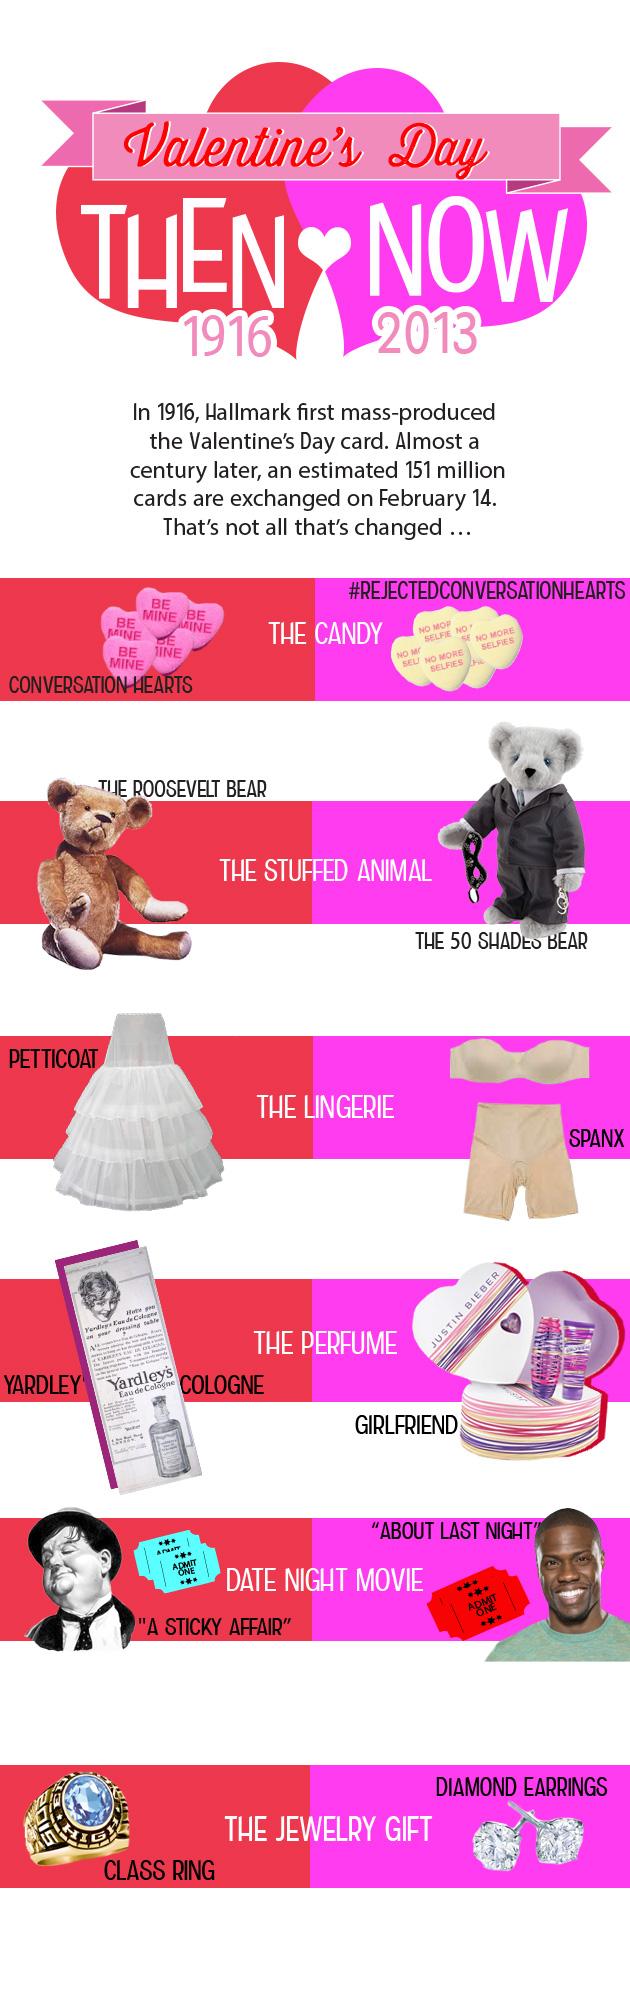 valentinesday-infographic